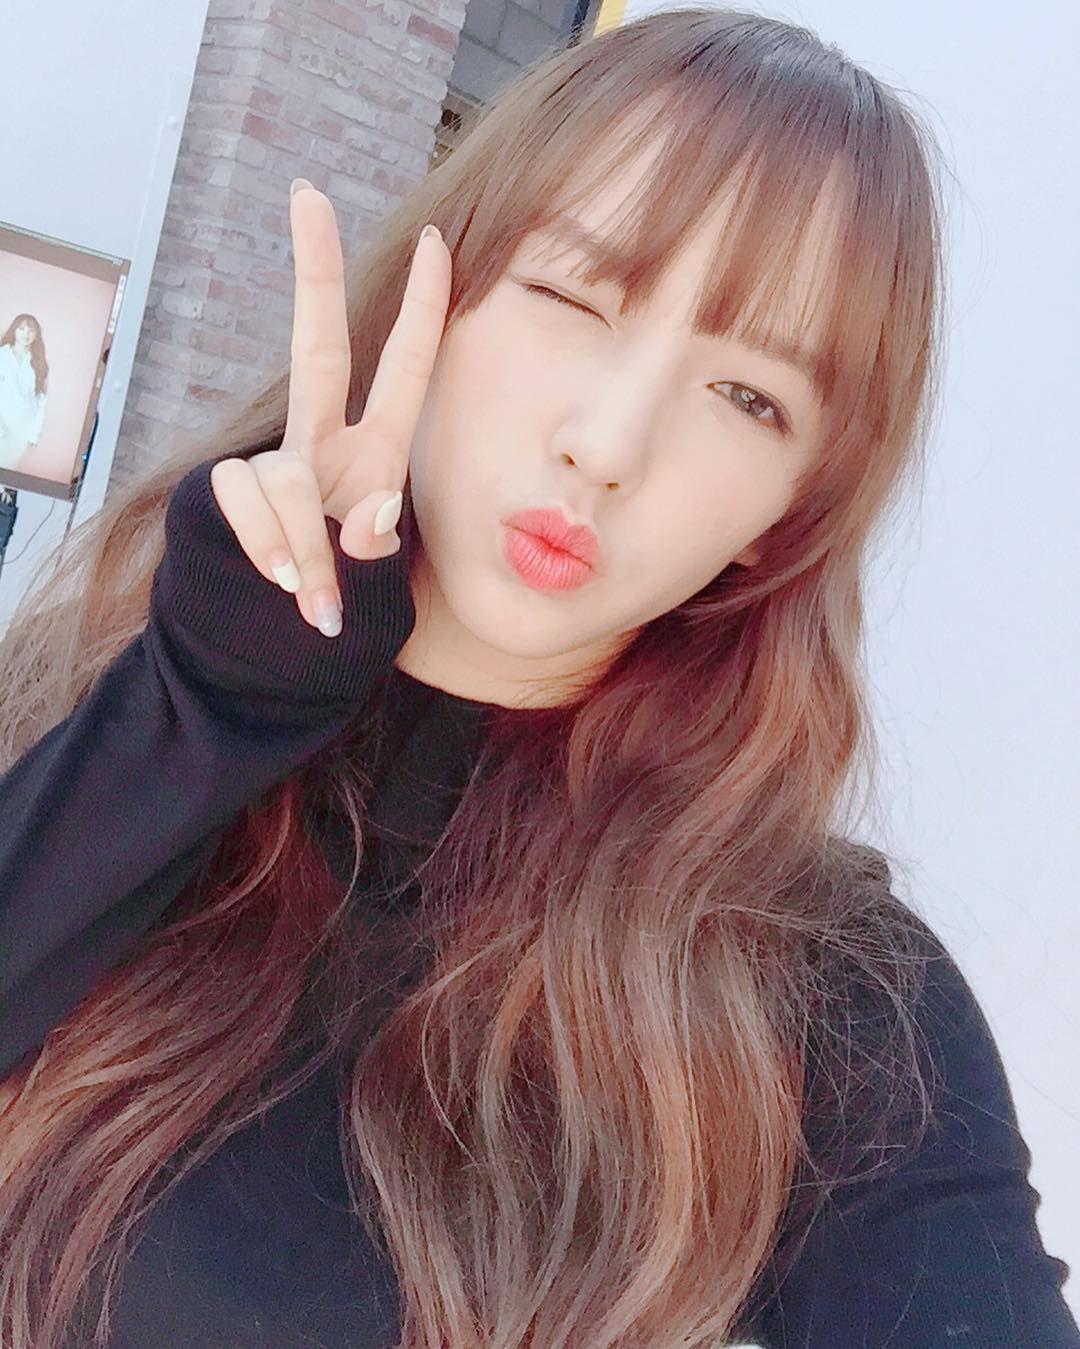 Cheng xiao kpics kpop sweetgirls lovethem love